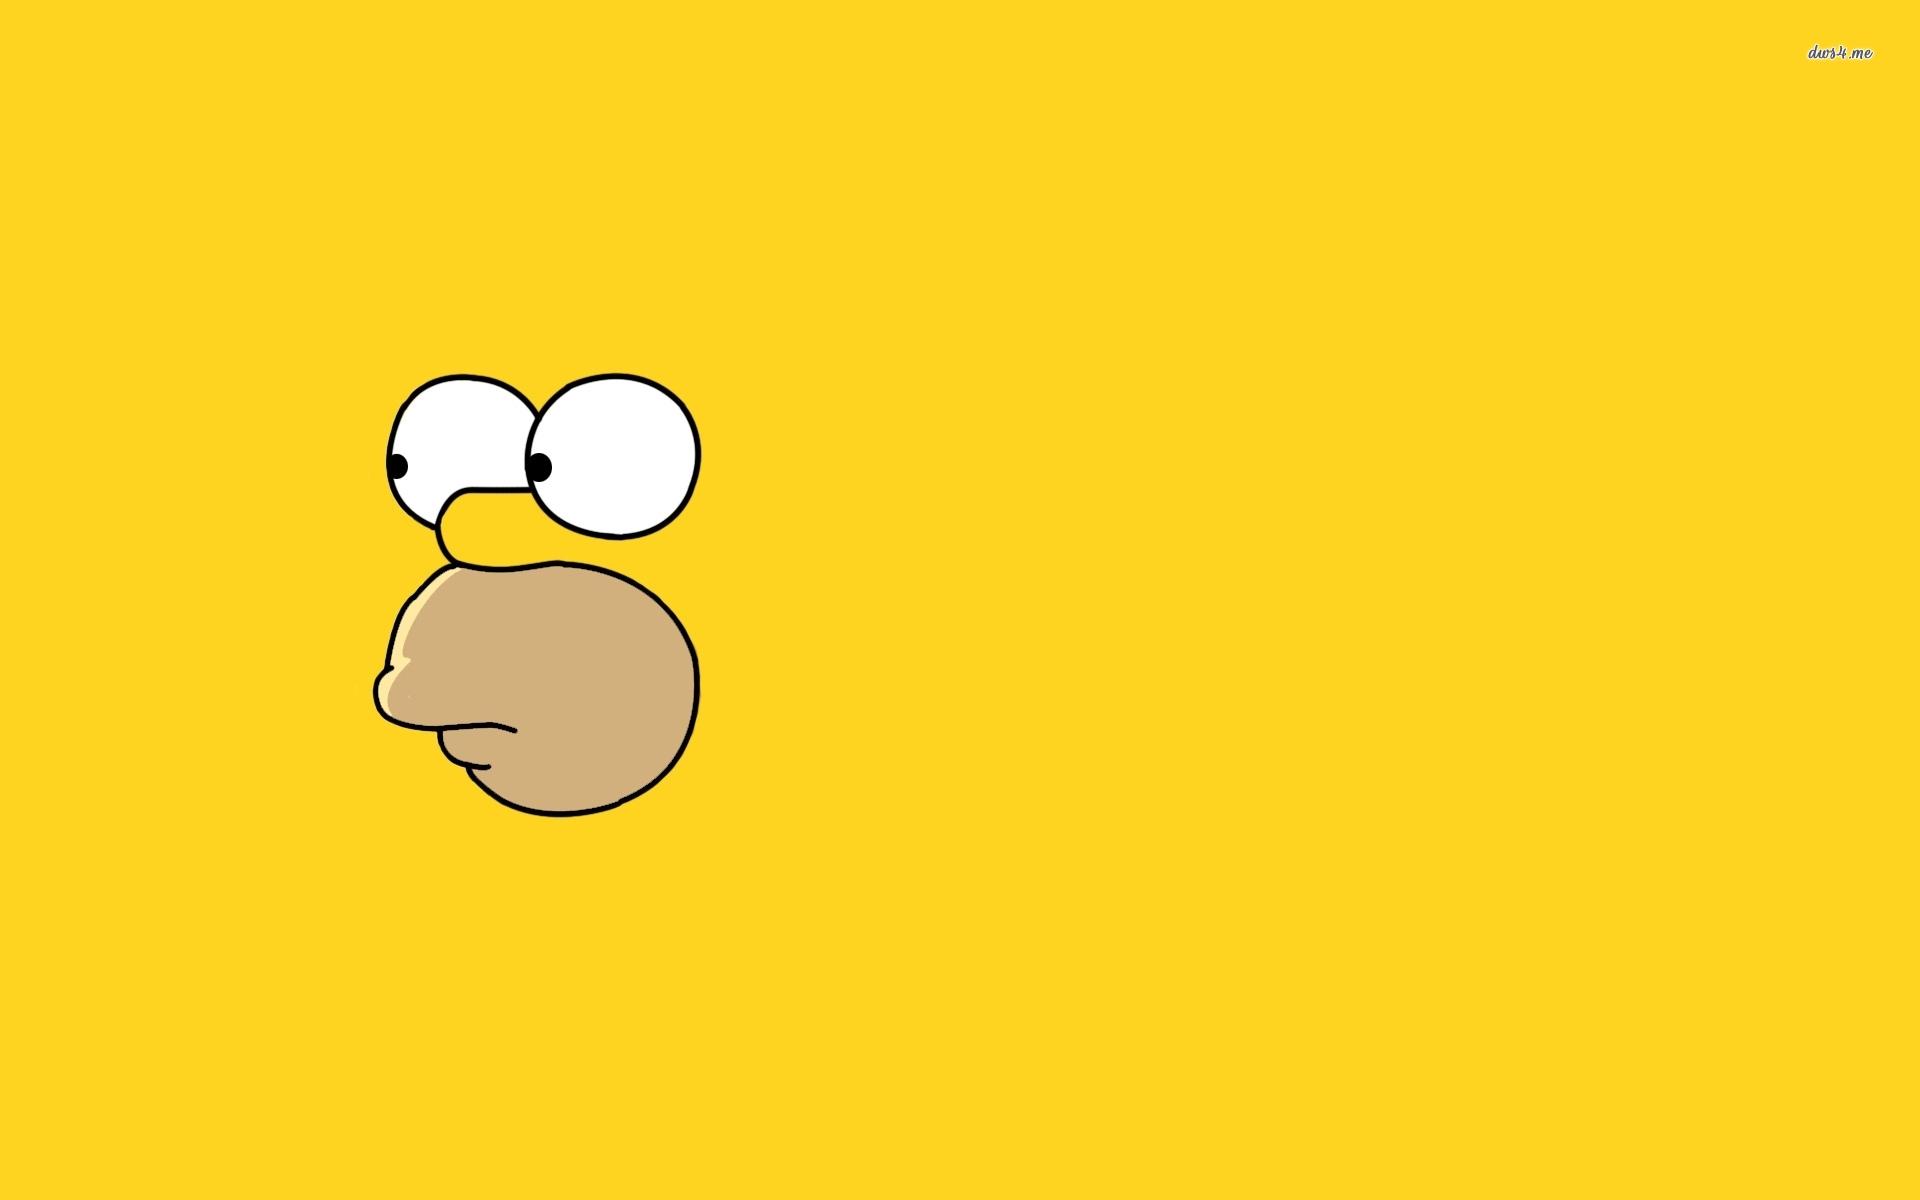 Homer Simpson   The Simpsons wallpaper   Cartoon wallpapers 1920x1200